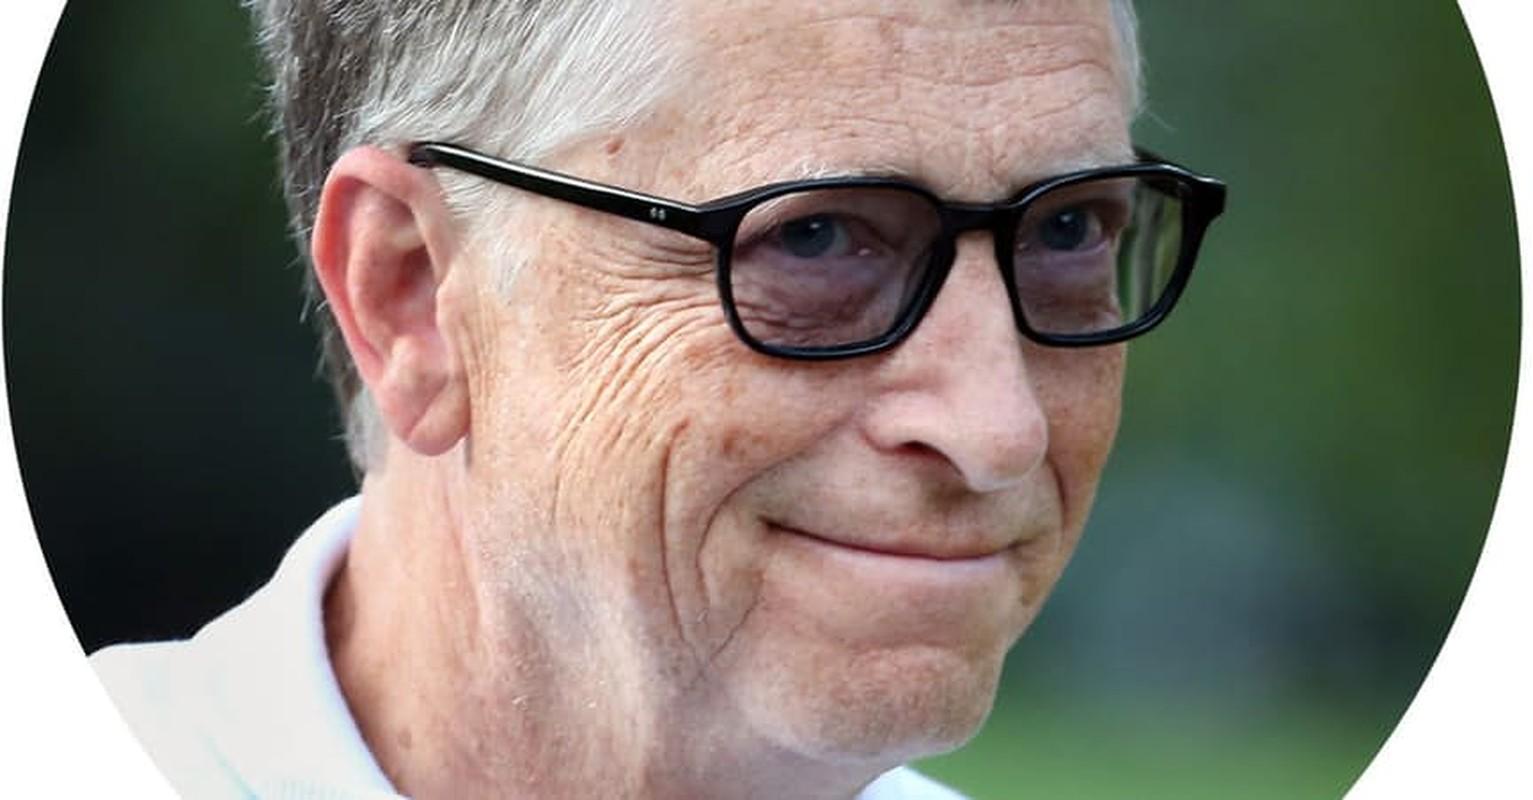 12 dieu it biet ve nha tu thien- ty phu Bill Gates